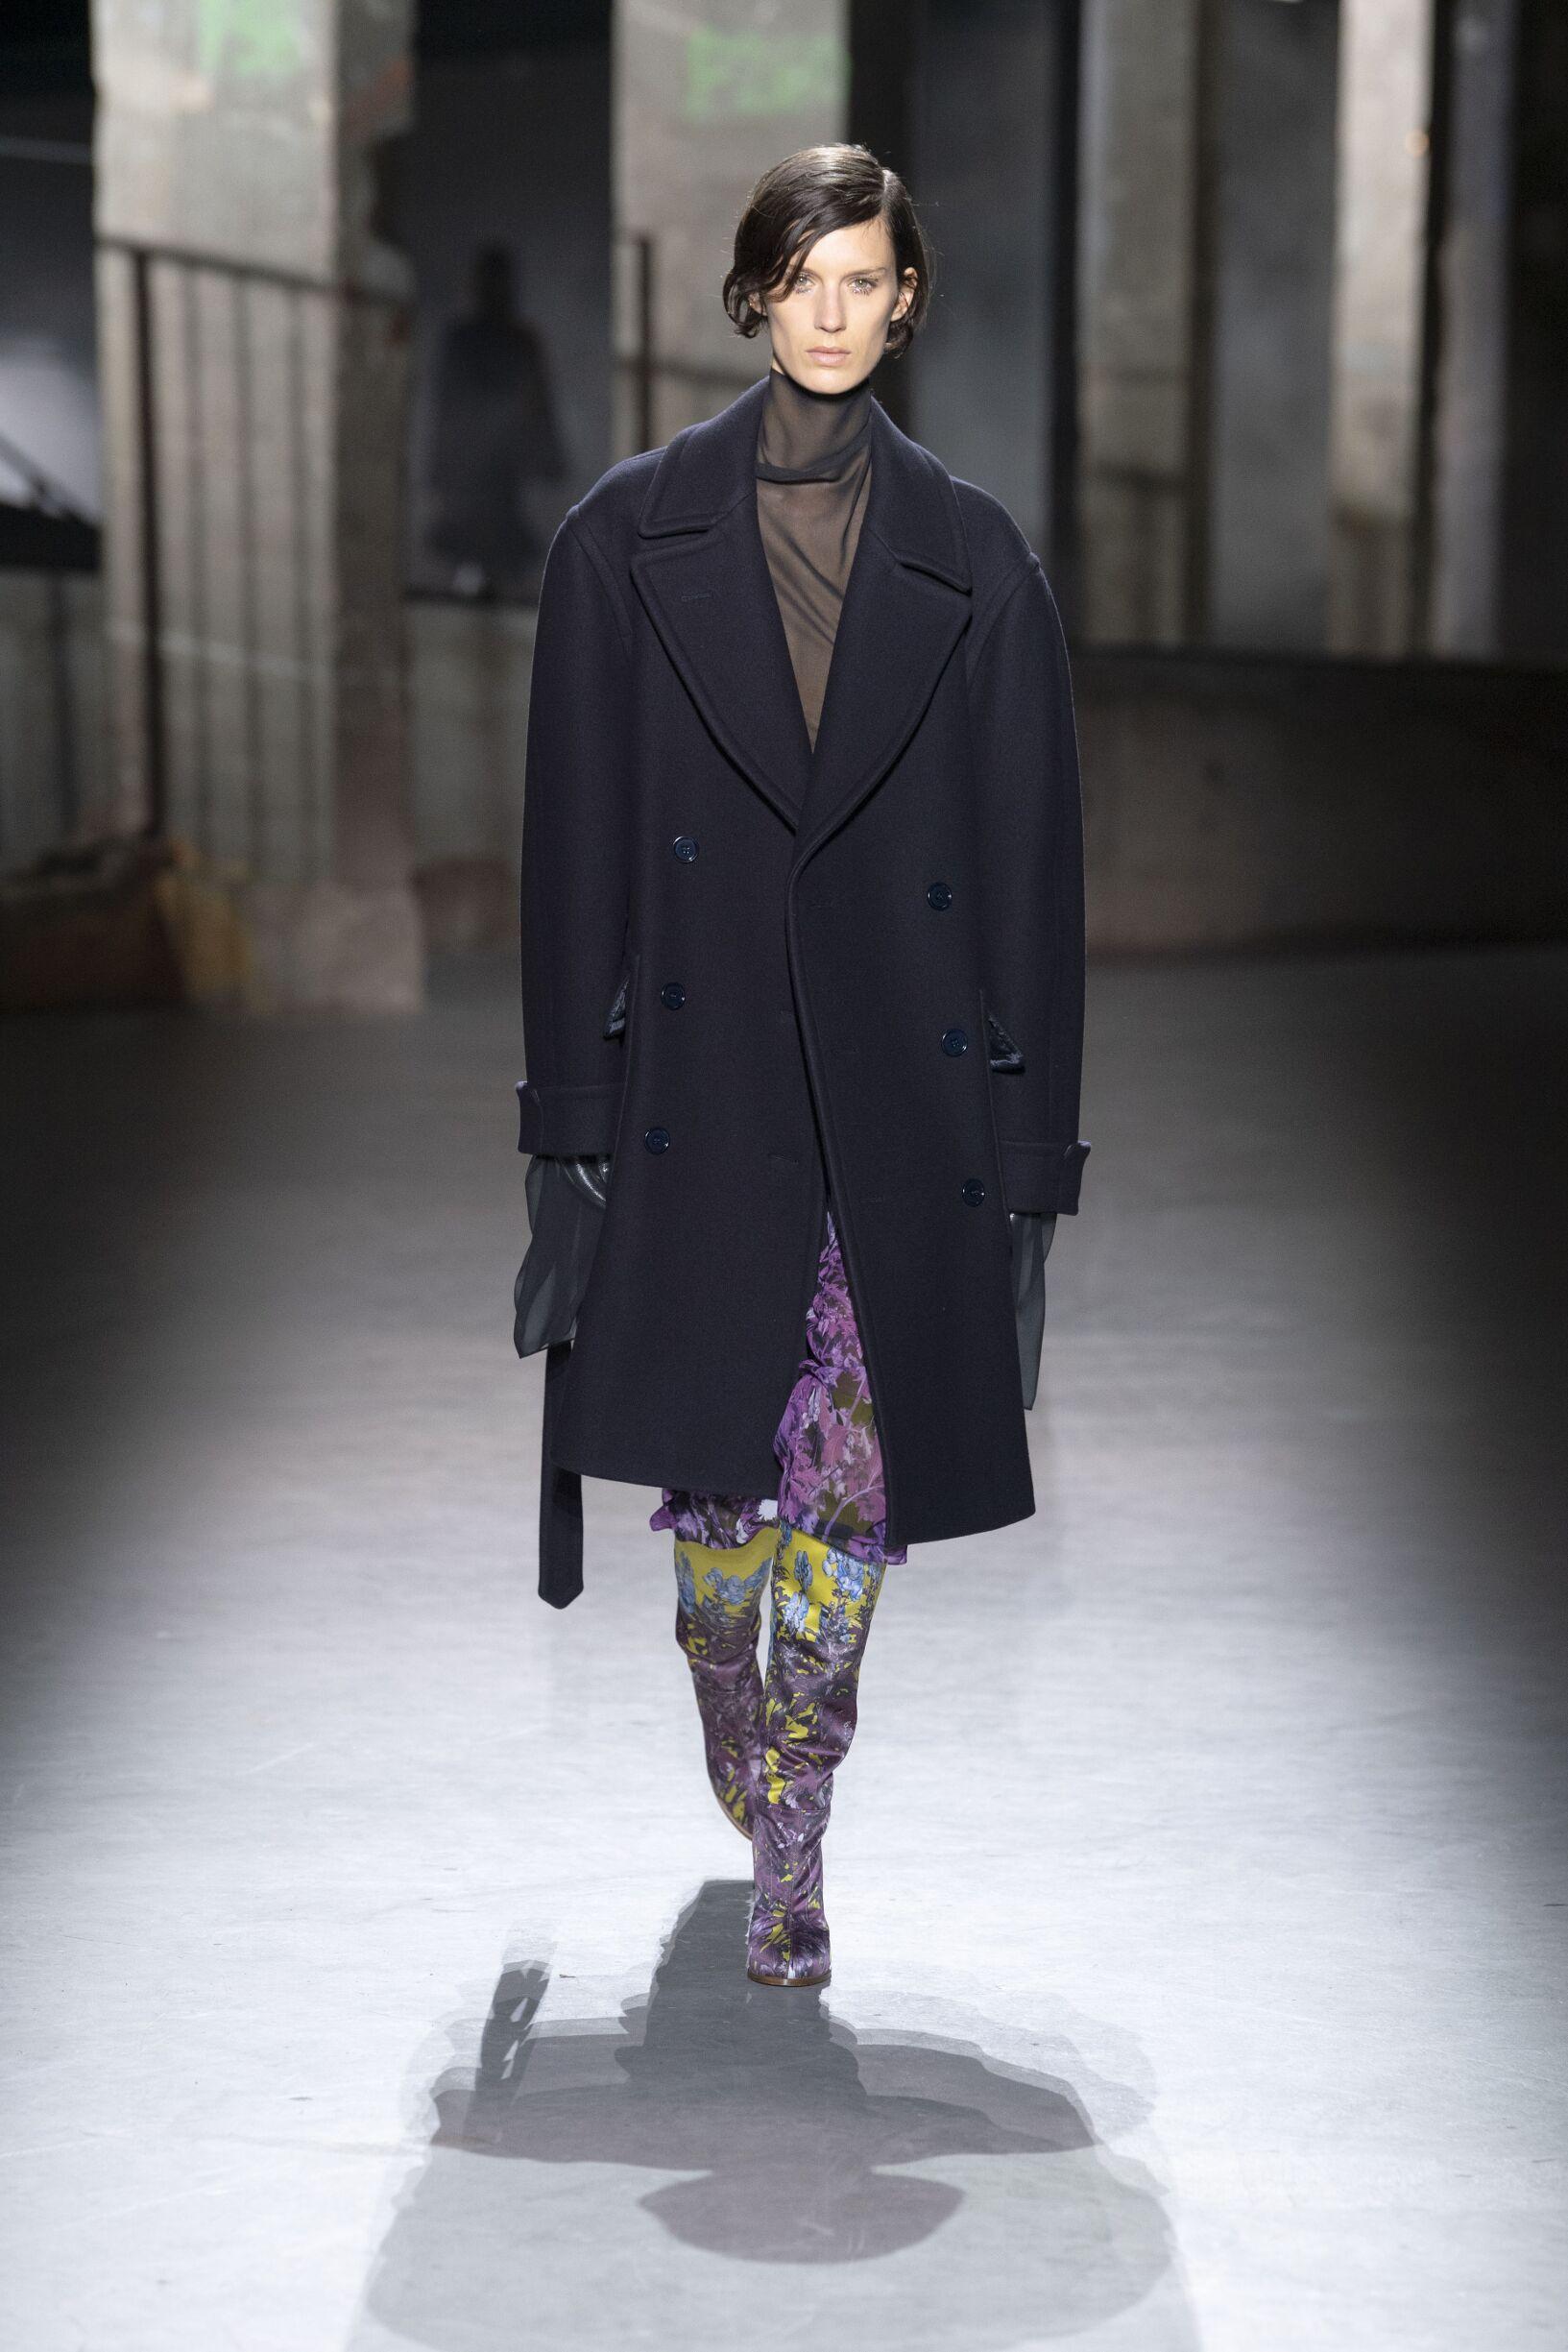 Catwalk Dries van Noten Woman Fashion Show Winter 2019